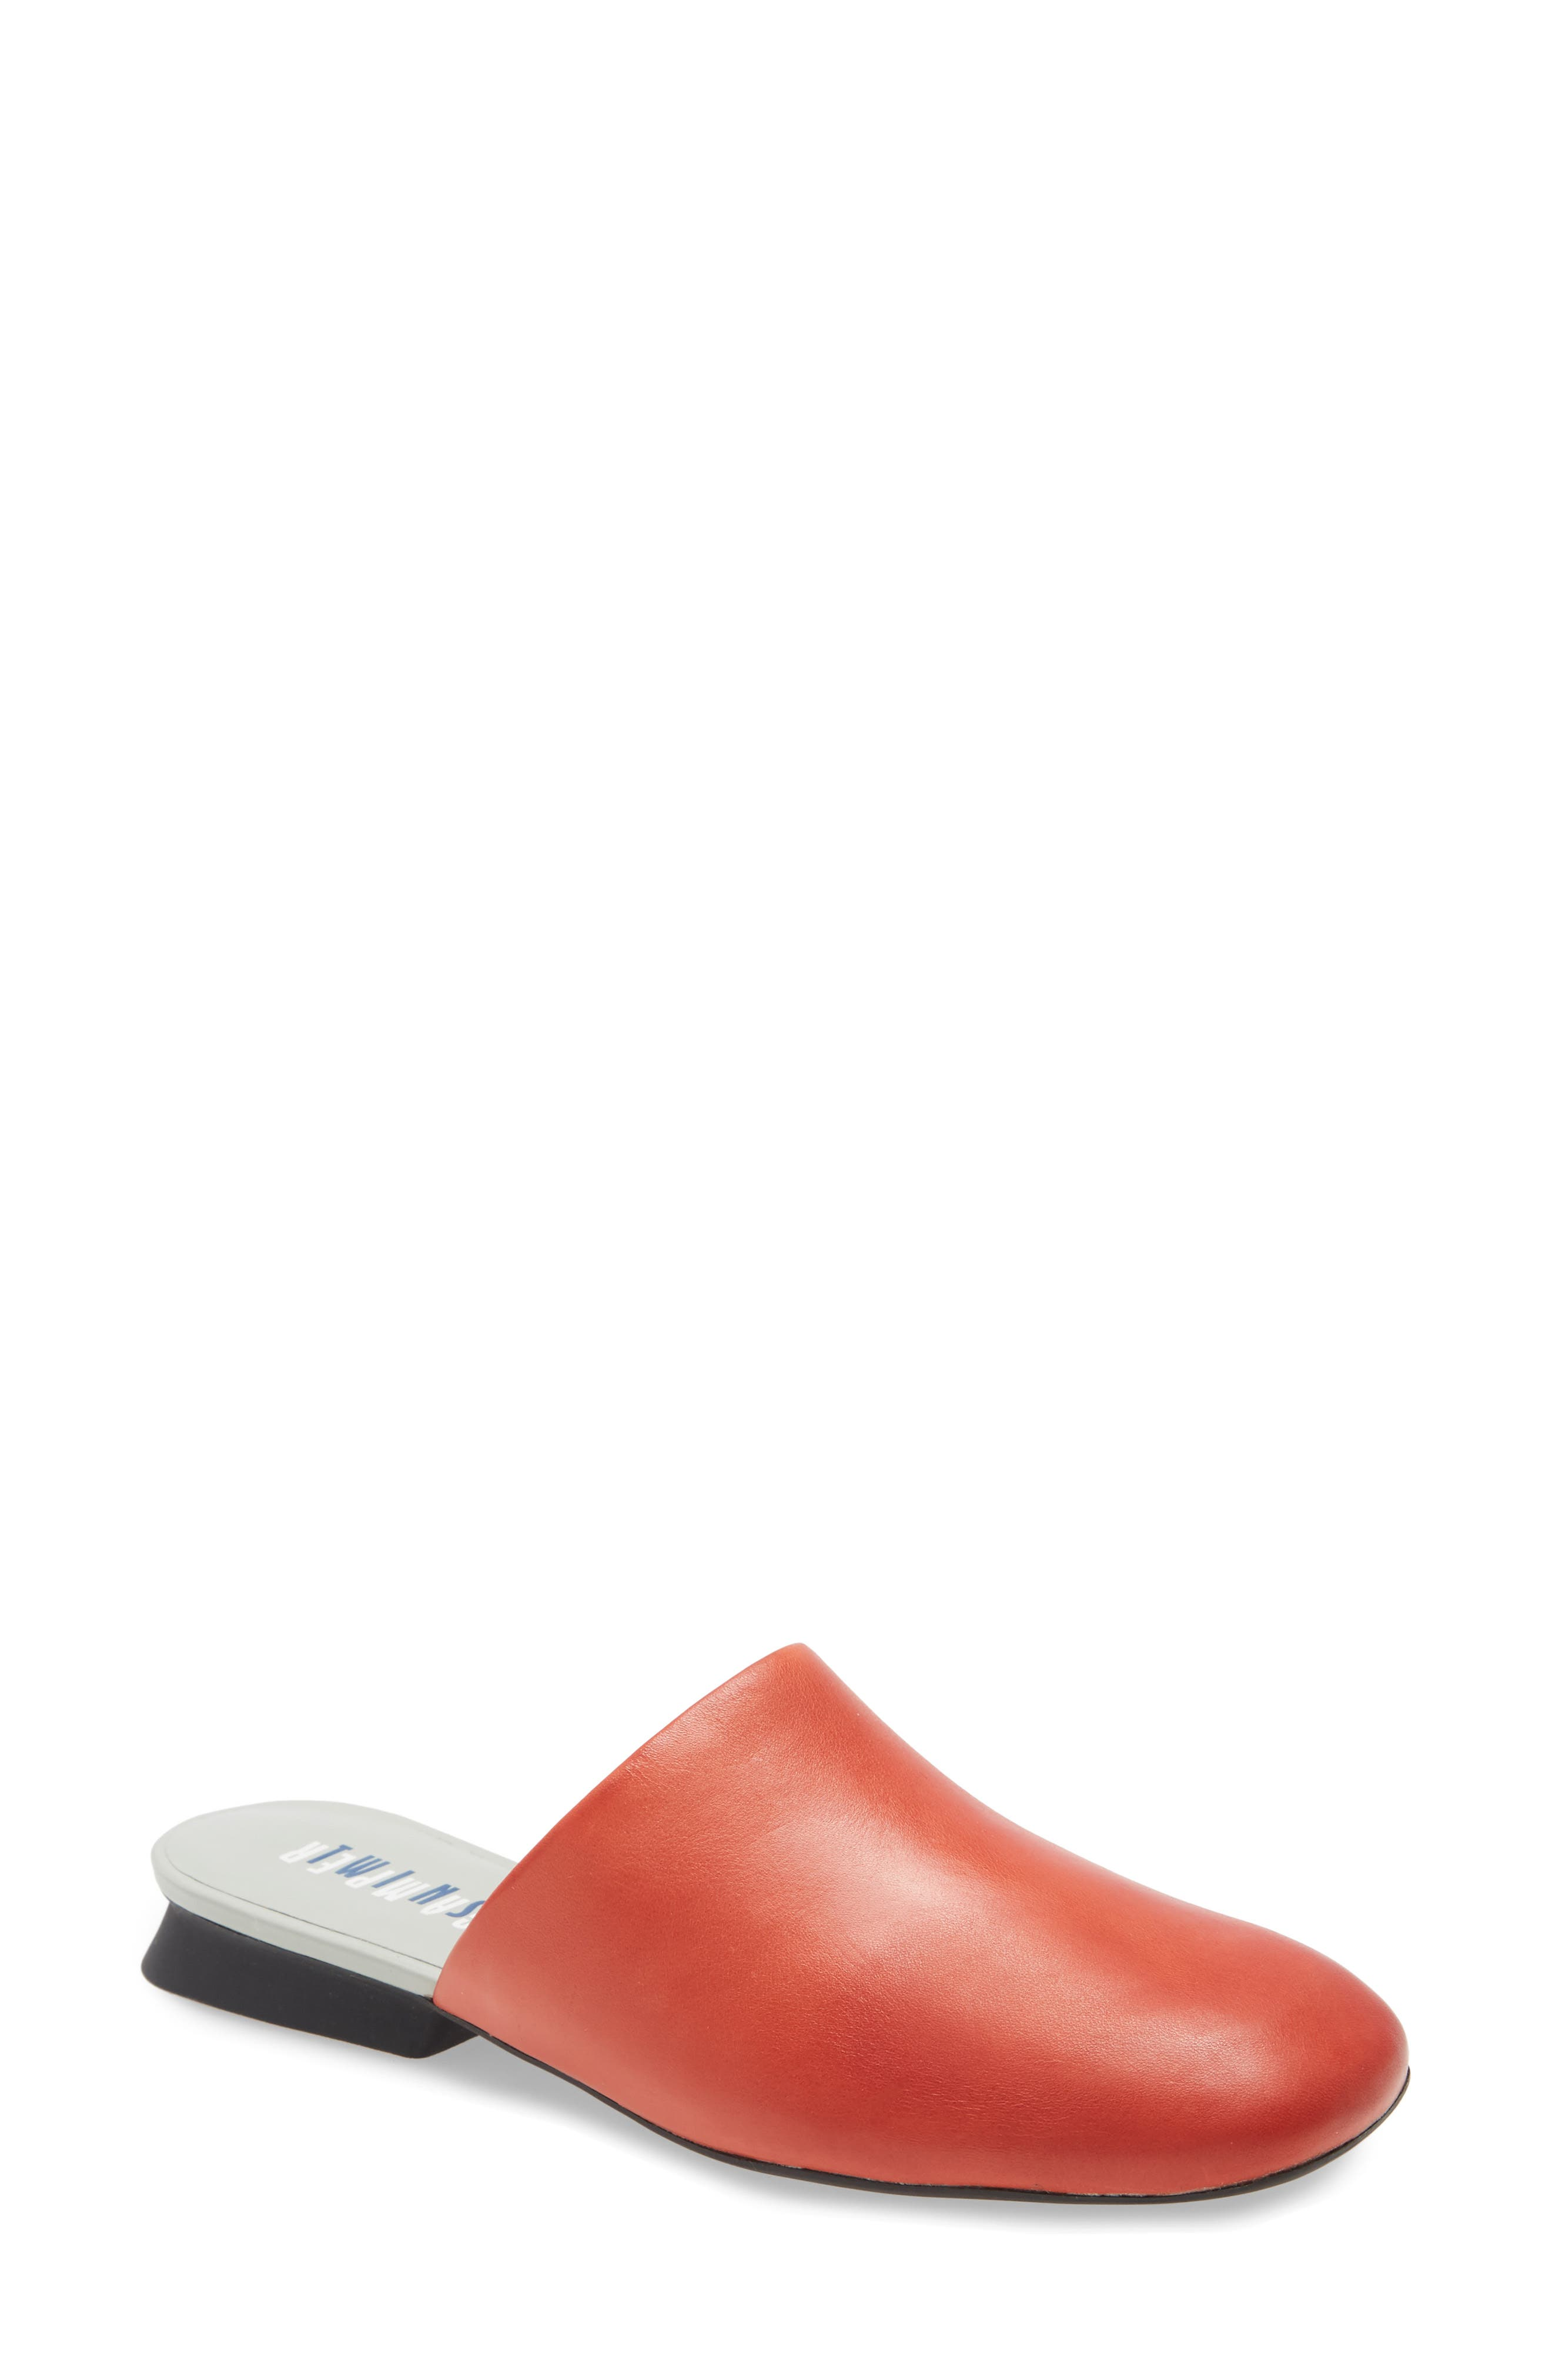 Women's Camper Shoes Sale \u0026 Clearance